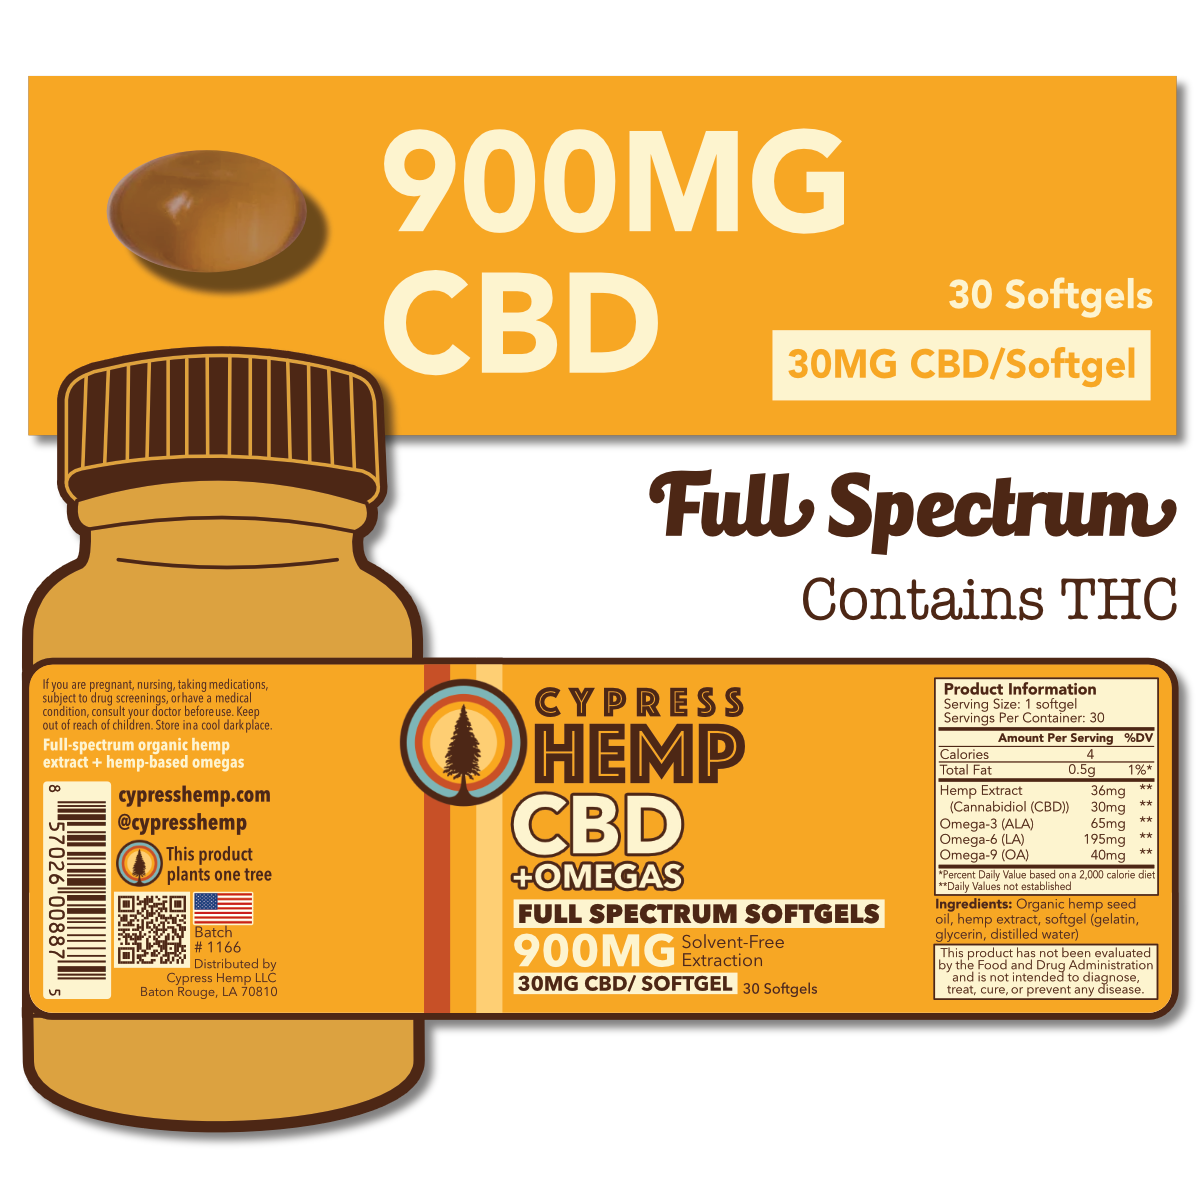 Cypress Hemp Cypress Hemp Full Spectrum CBD + OMEGAS™ Softgels - 30ct 900mg